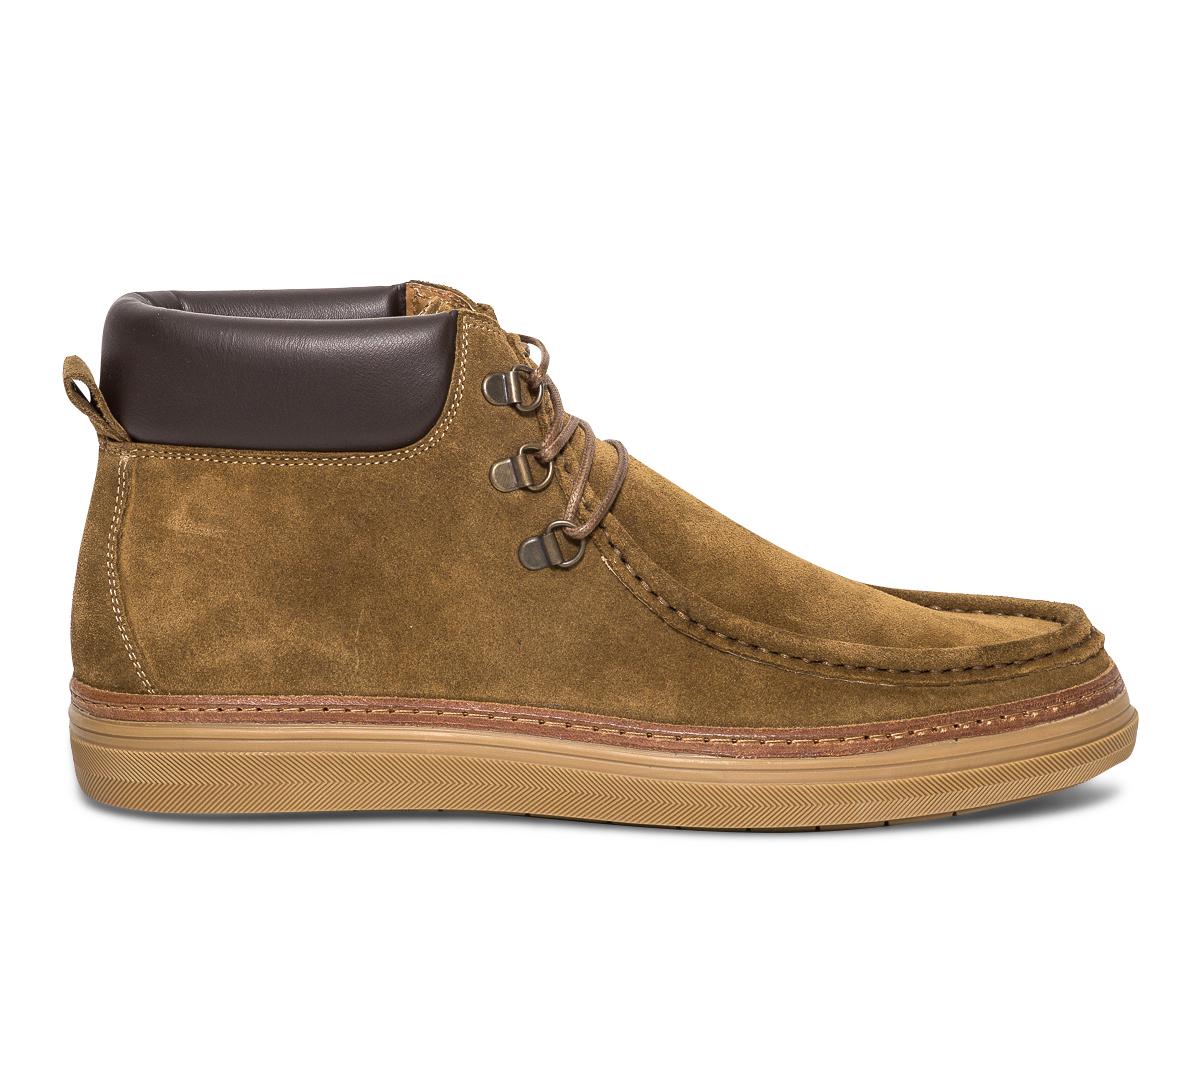 Velours Eram Plateau Cuir Marron Boots En kOPuiZTwX